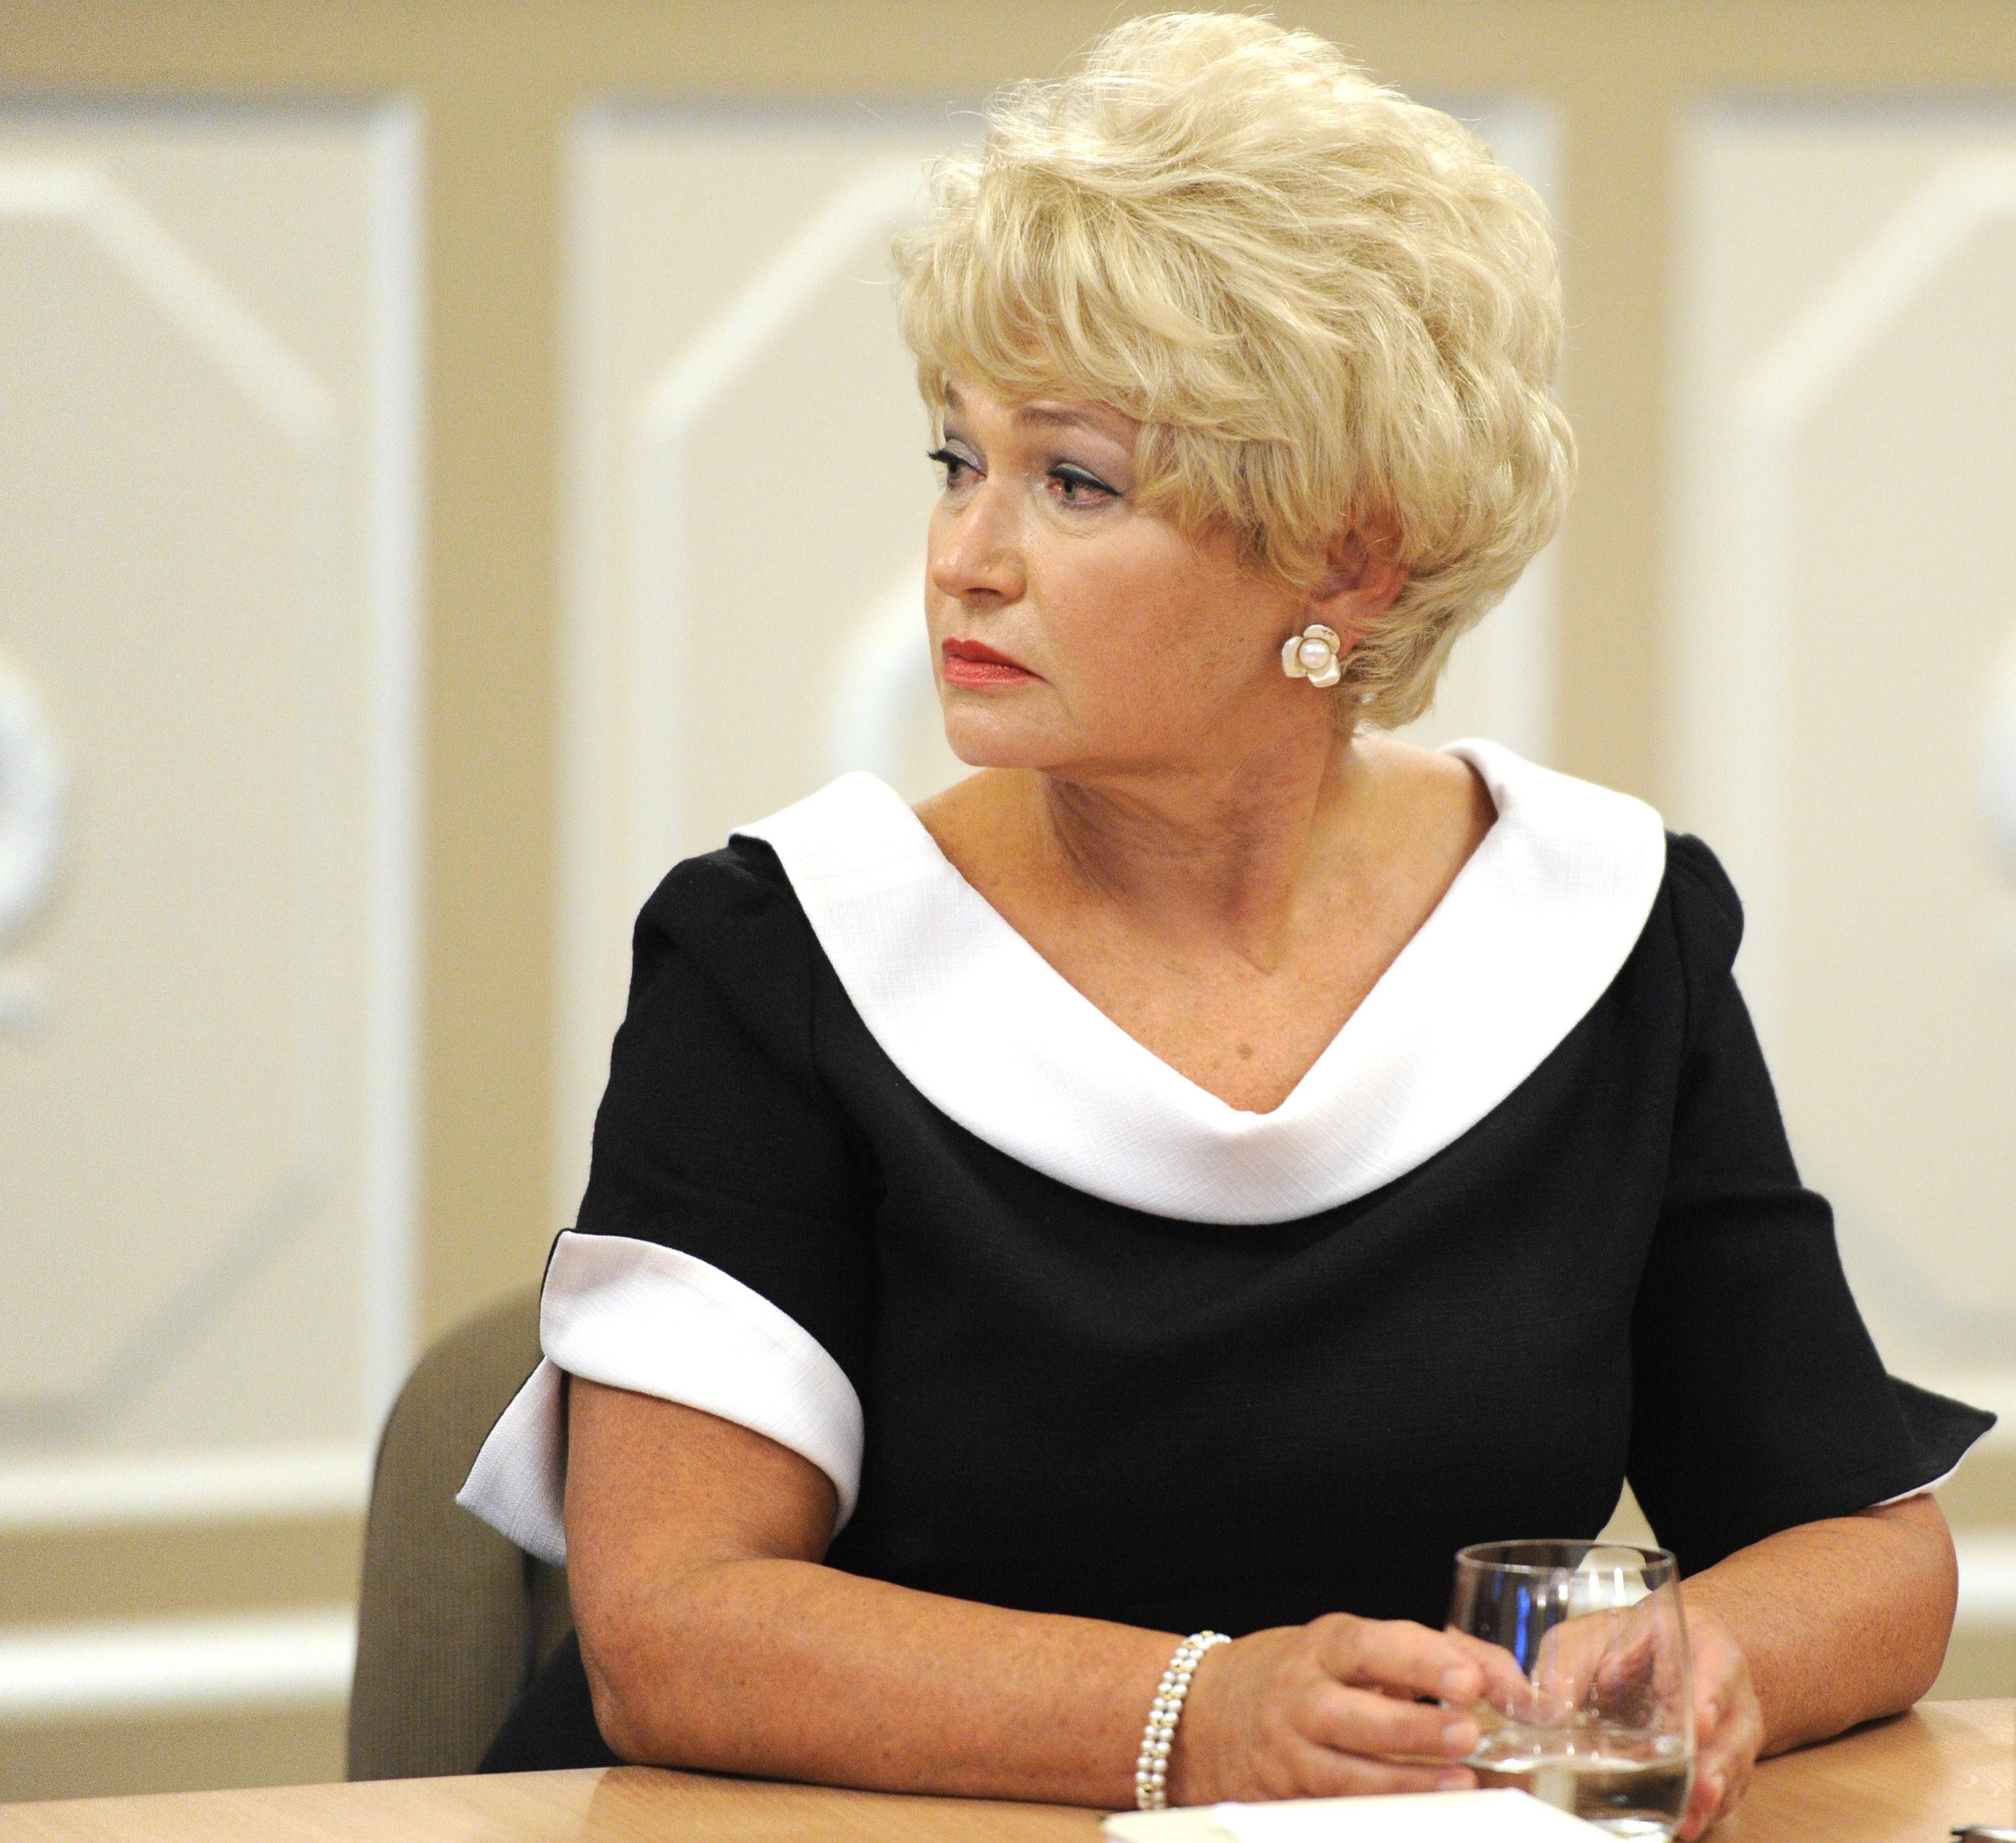 Людмила нарусова фото биография